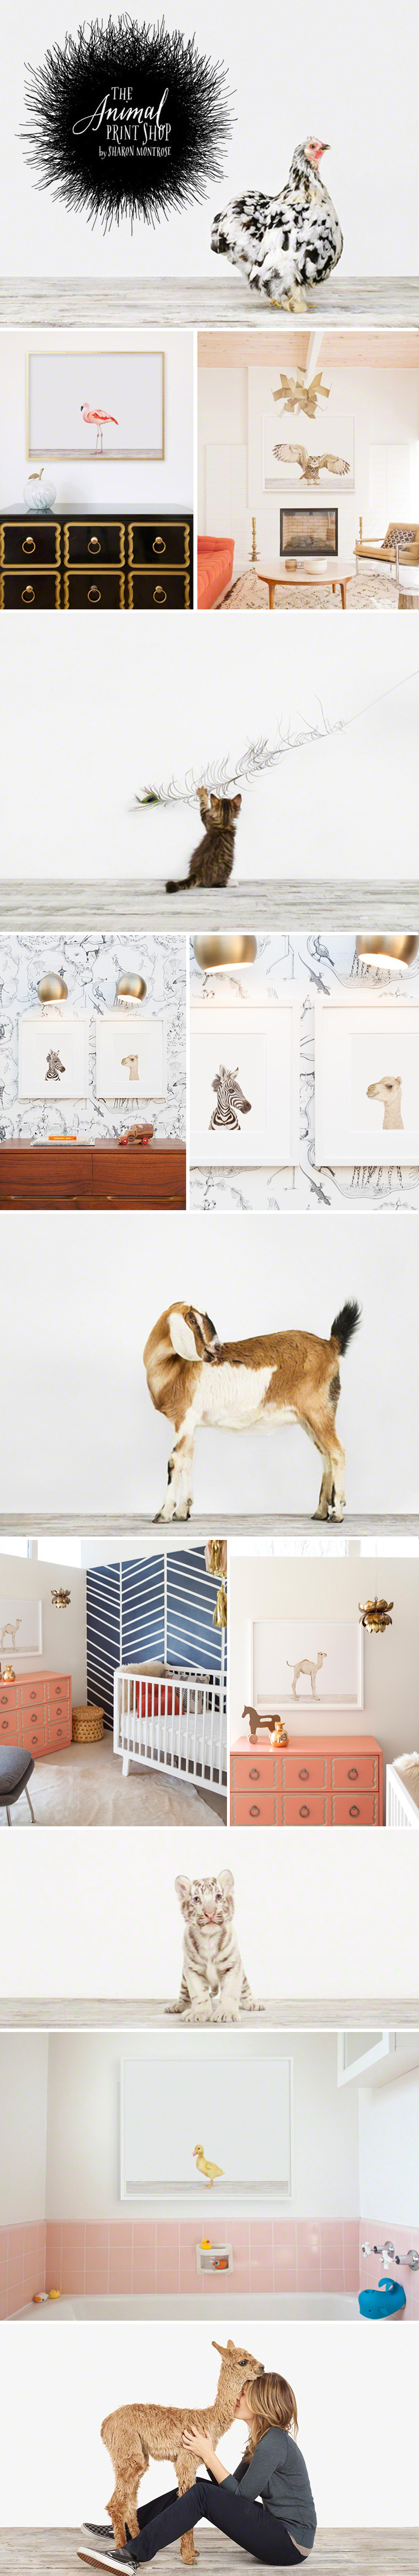 The-Animal-Print-Shop.jpg